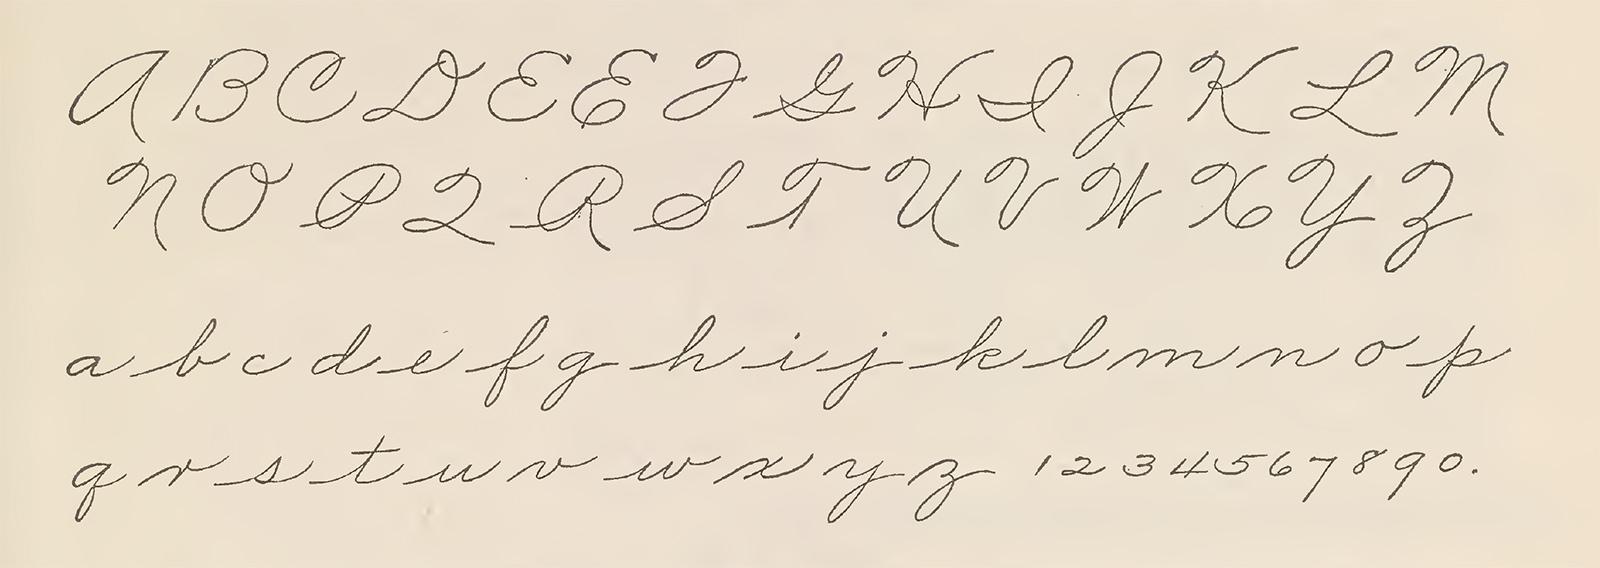 The Palmer Method alphabet